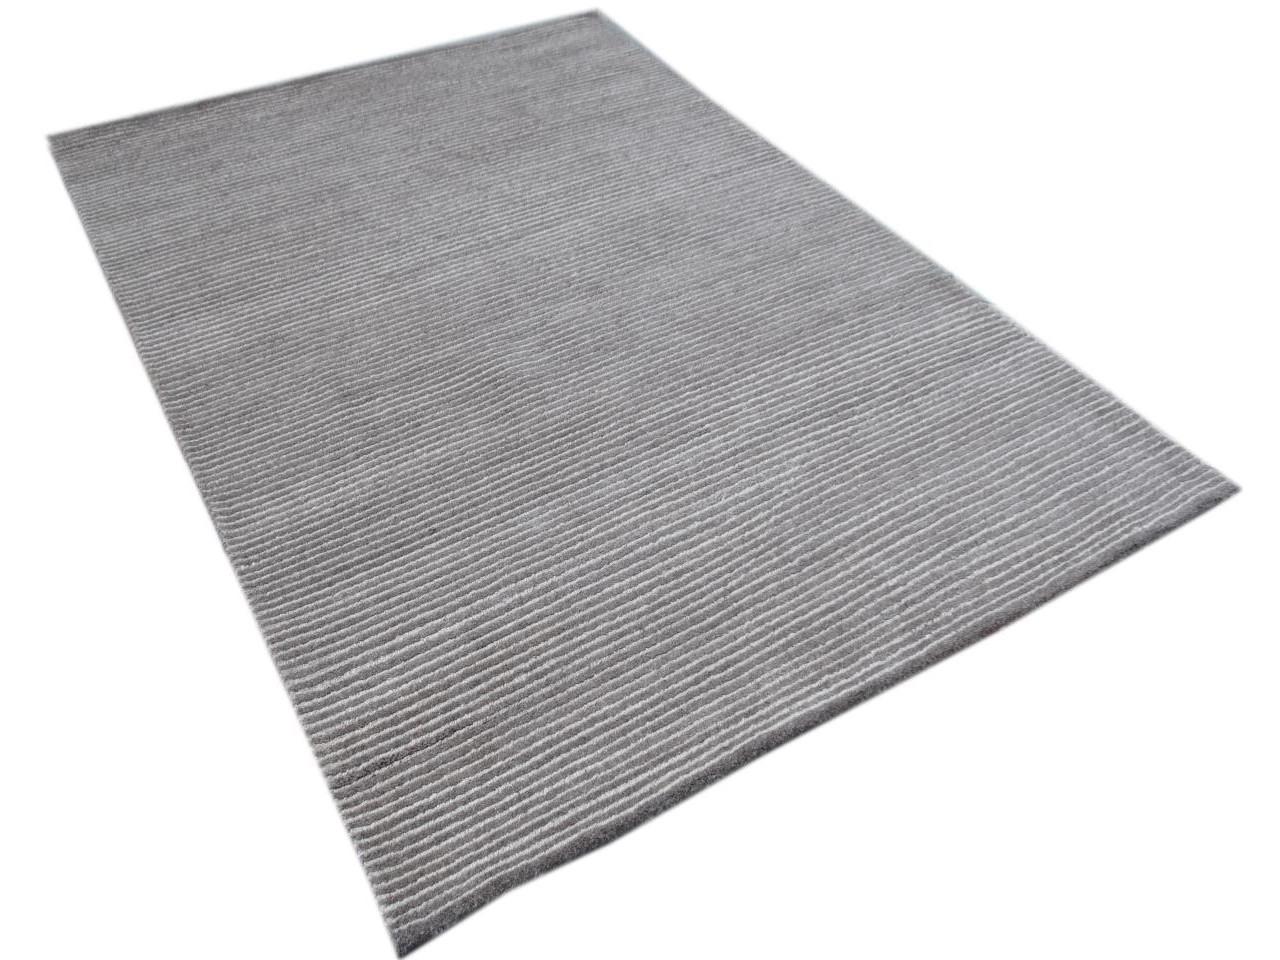 Chakia gris tapis design n 2149 200x140cm - Tapis 200x140 ...